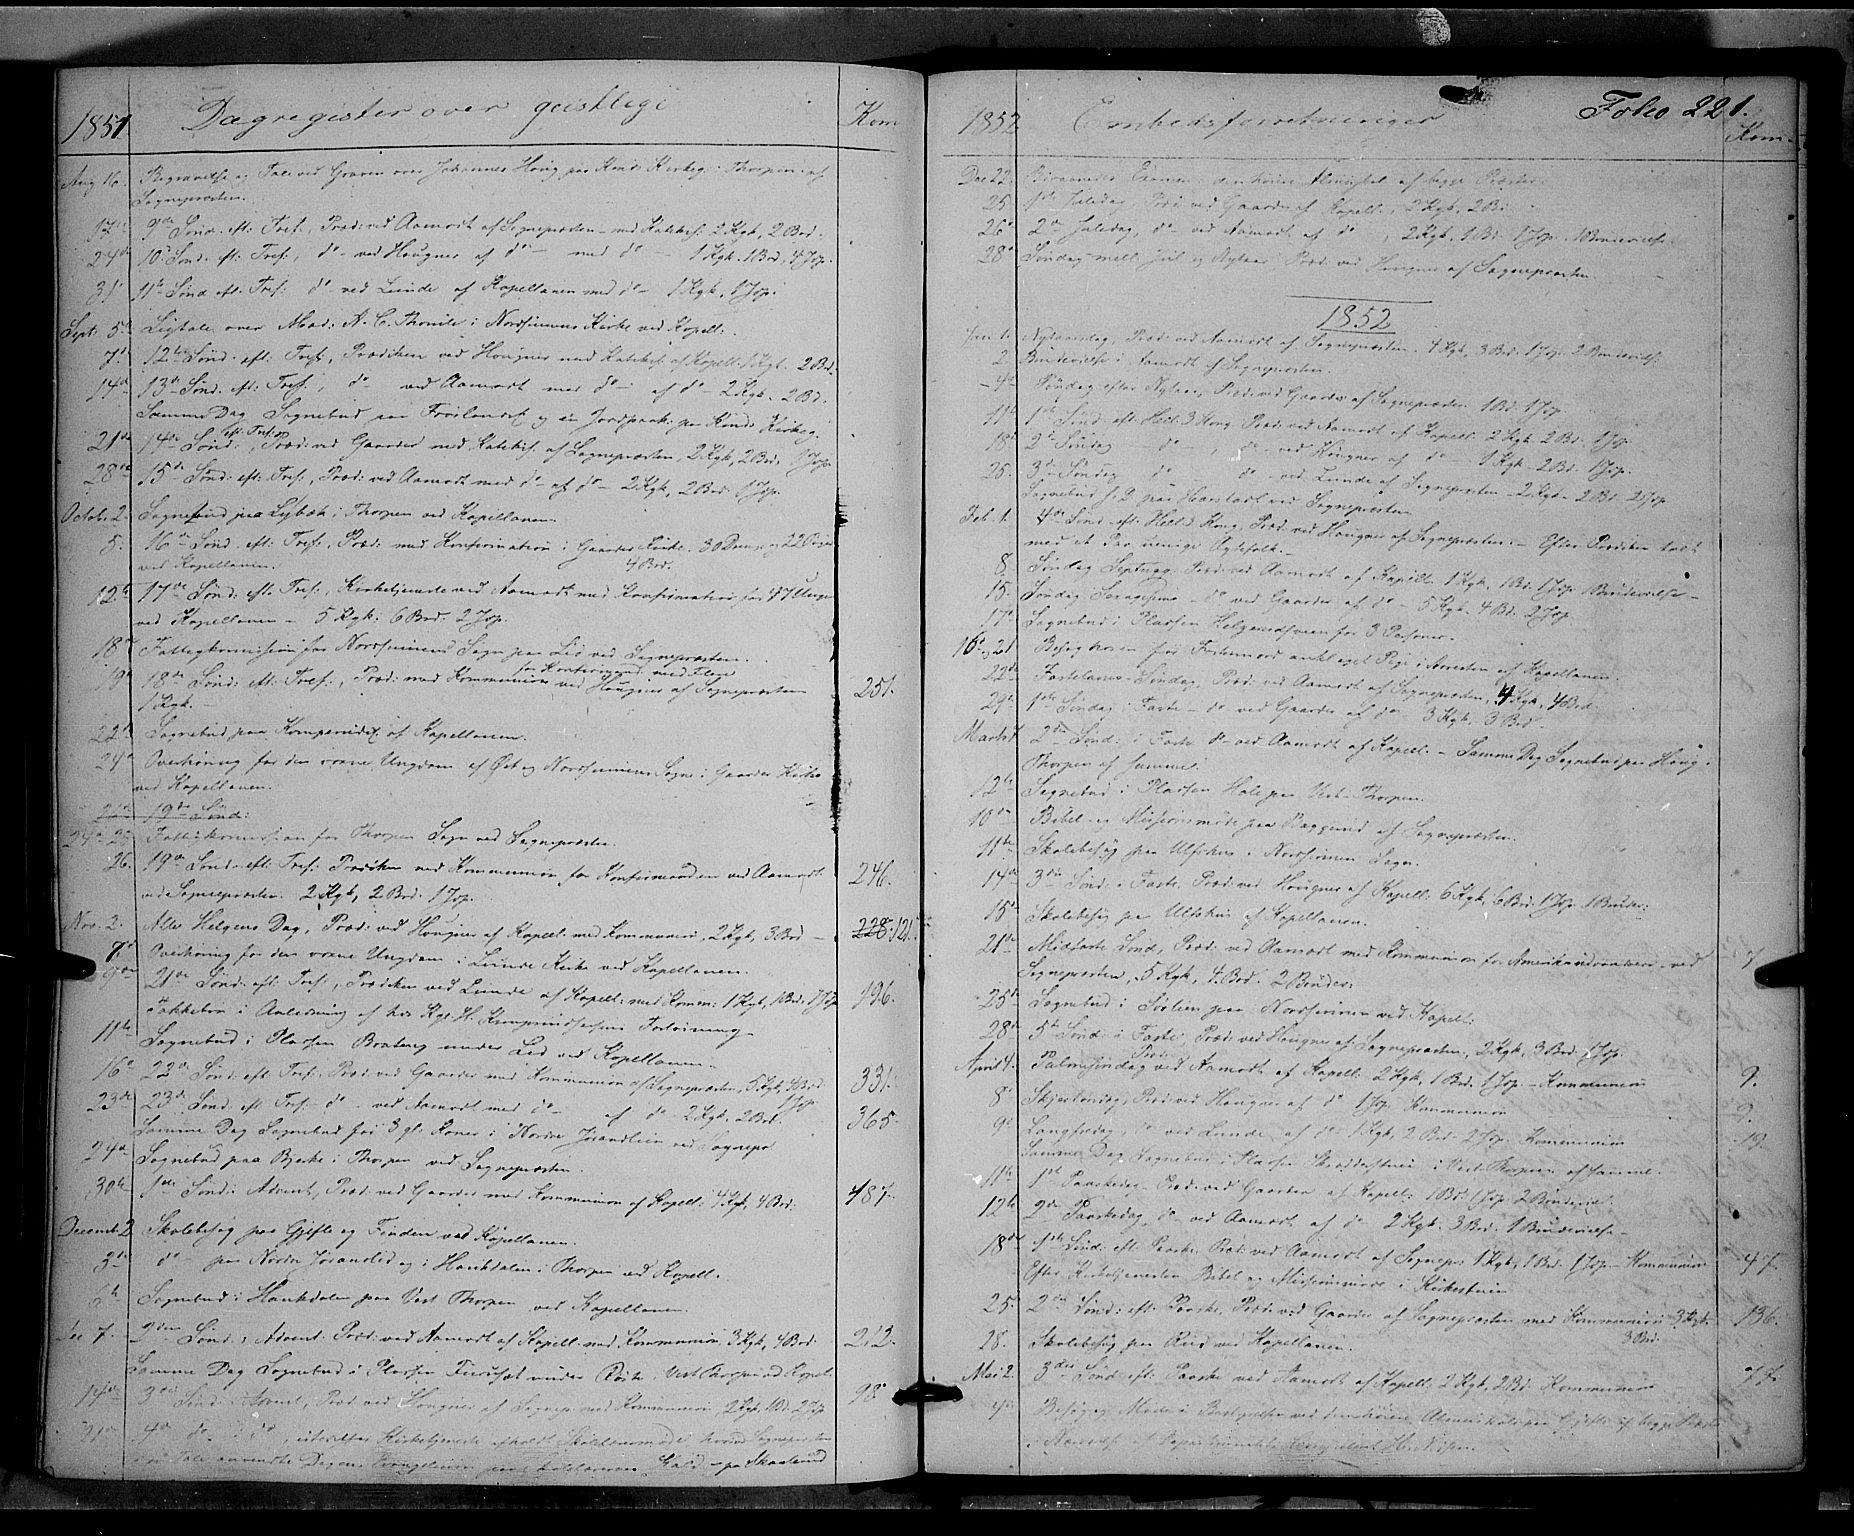 SAH, Land prestekontor, Ministerialbok nr. 10, 1847-1859, s. 221